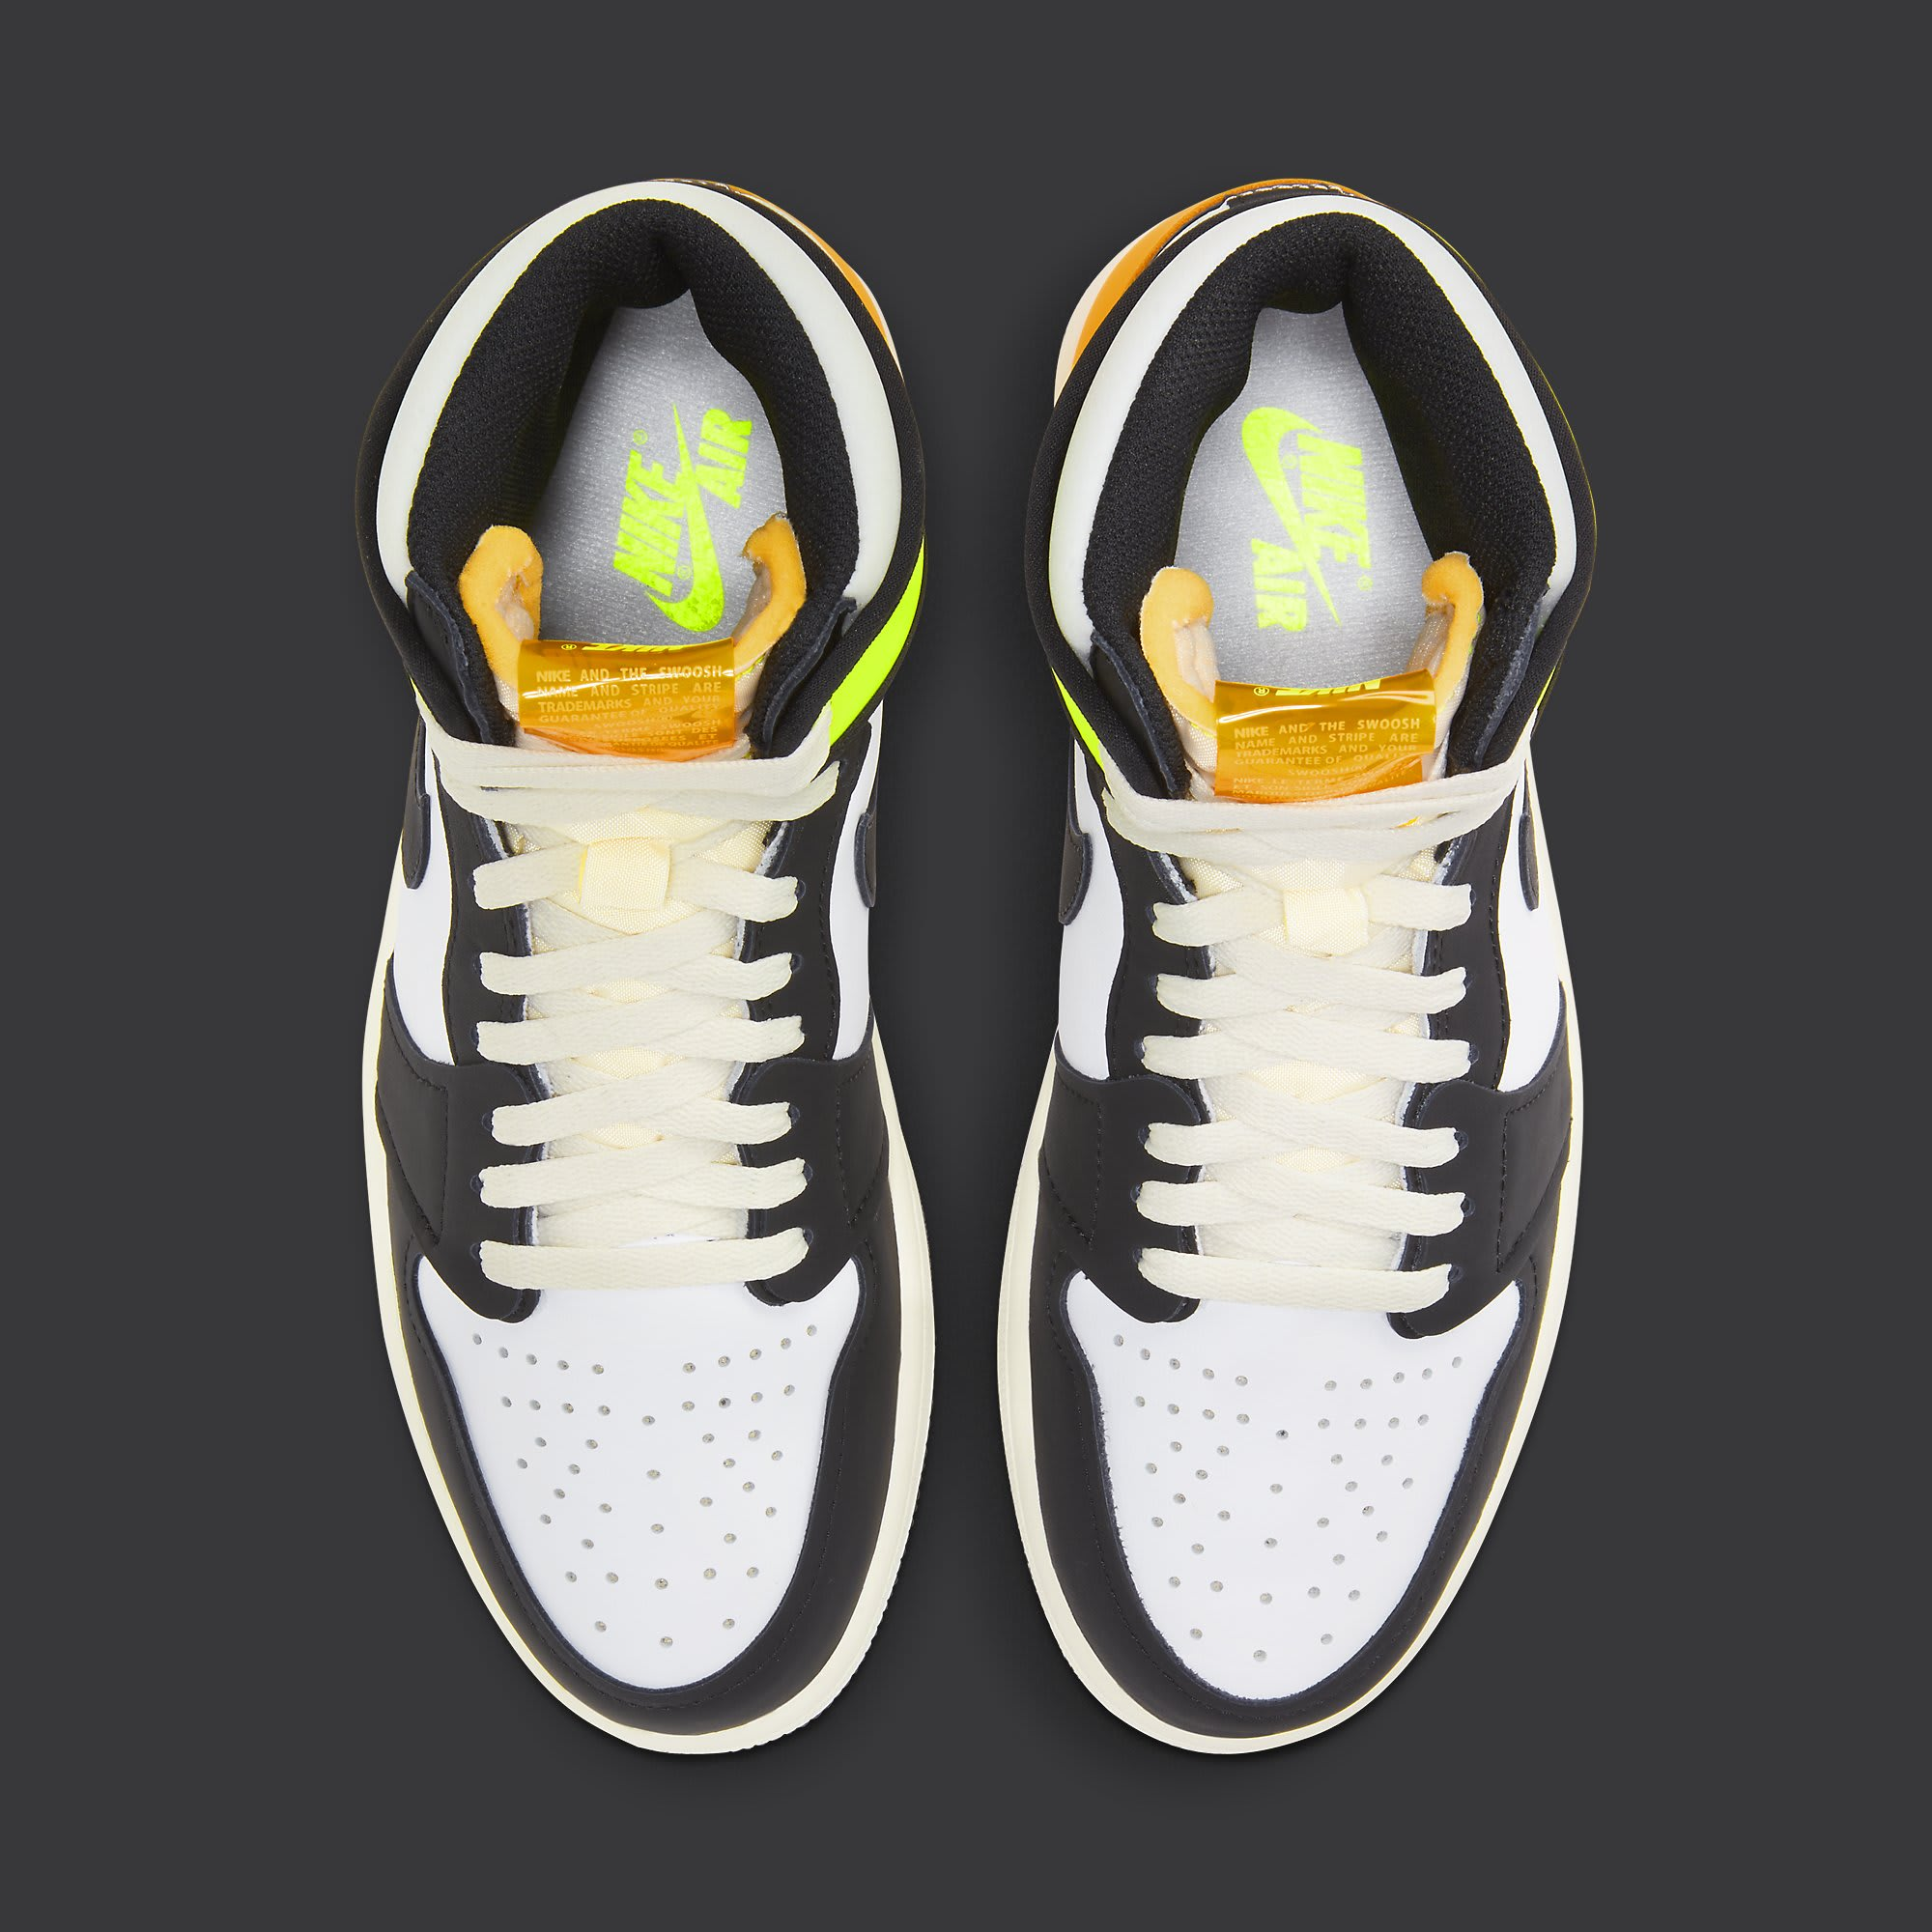 Air Jordan 1 Volt Gold Release Date 555088-118 Top